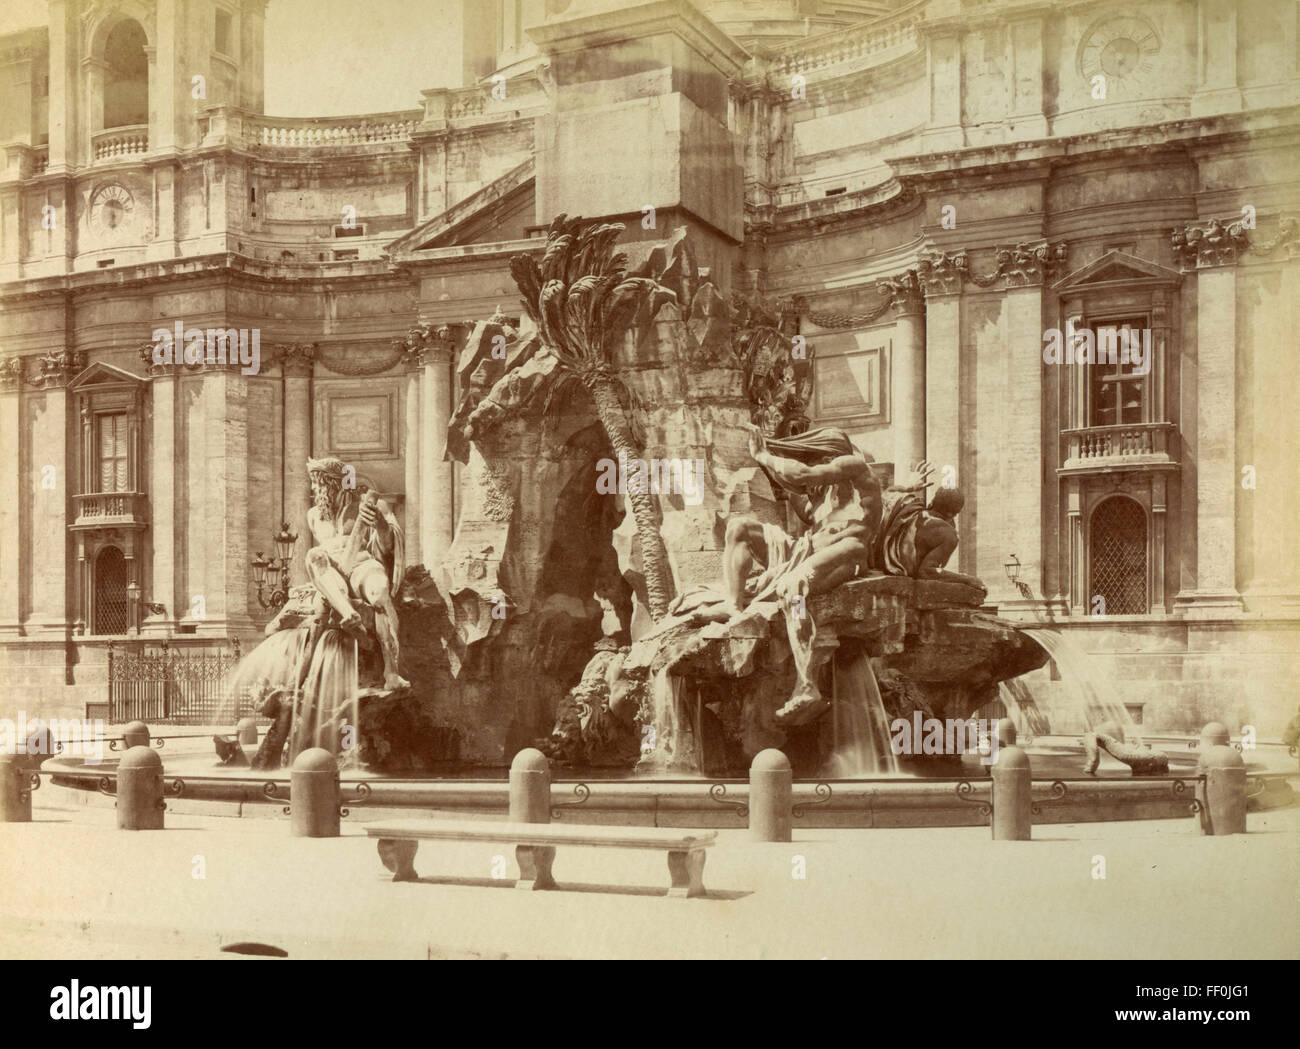 Fountain of the Four Rivers, Bernini, Piazza Navona, Rome, Italy - Stock Image